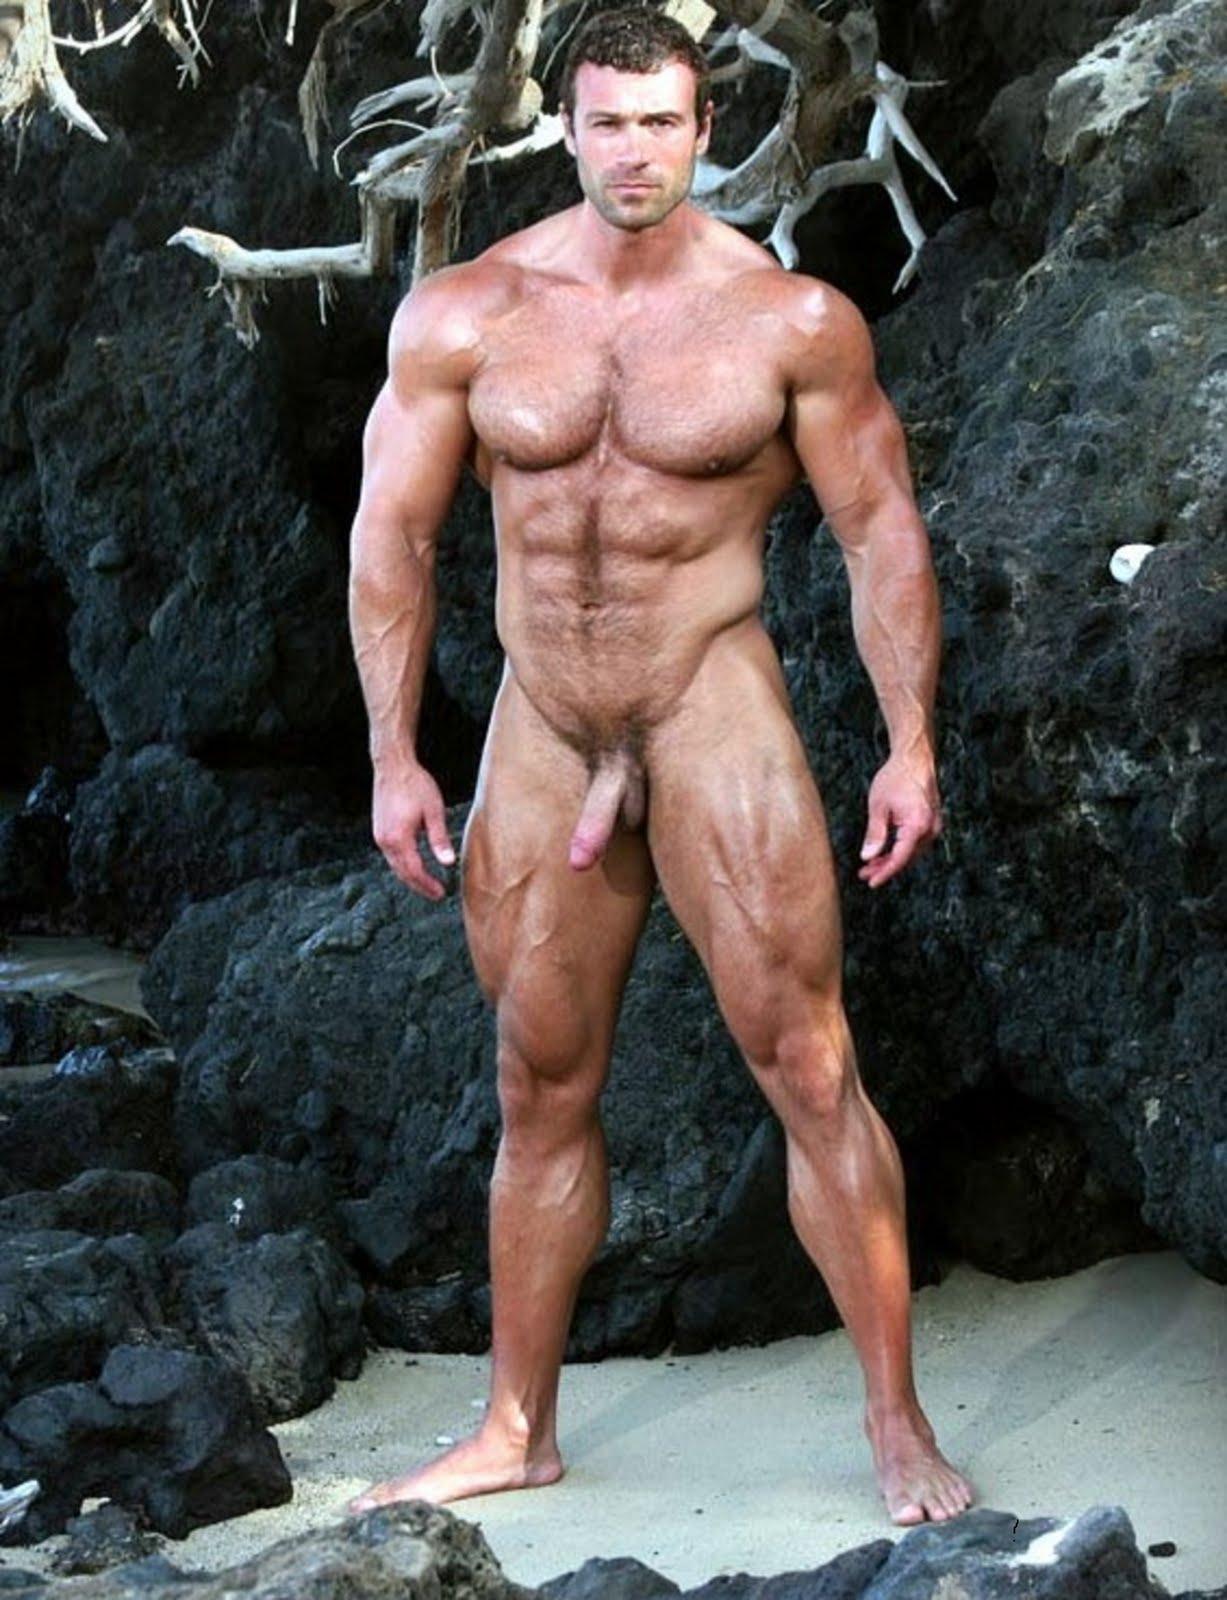 Naked male goths images pron image